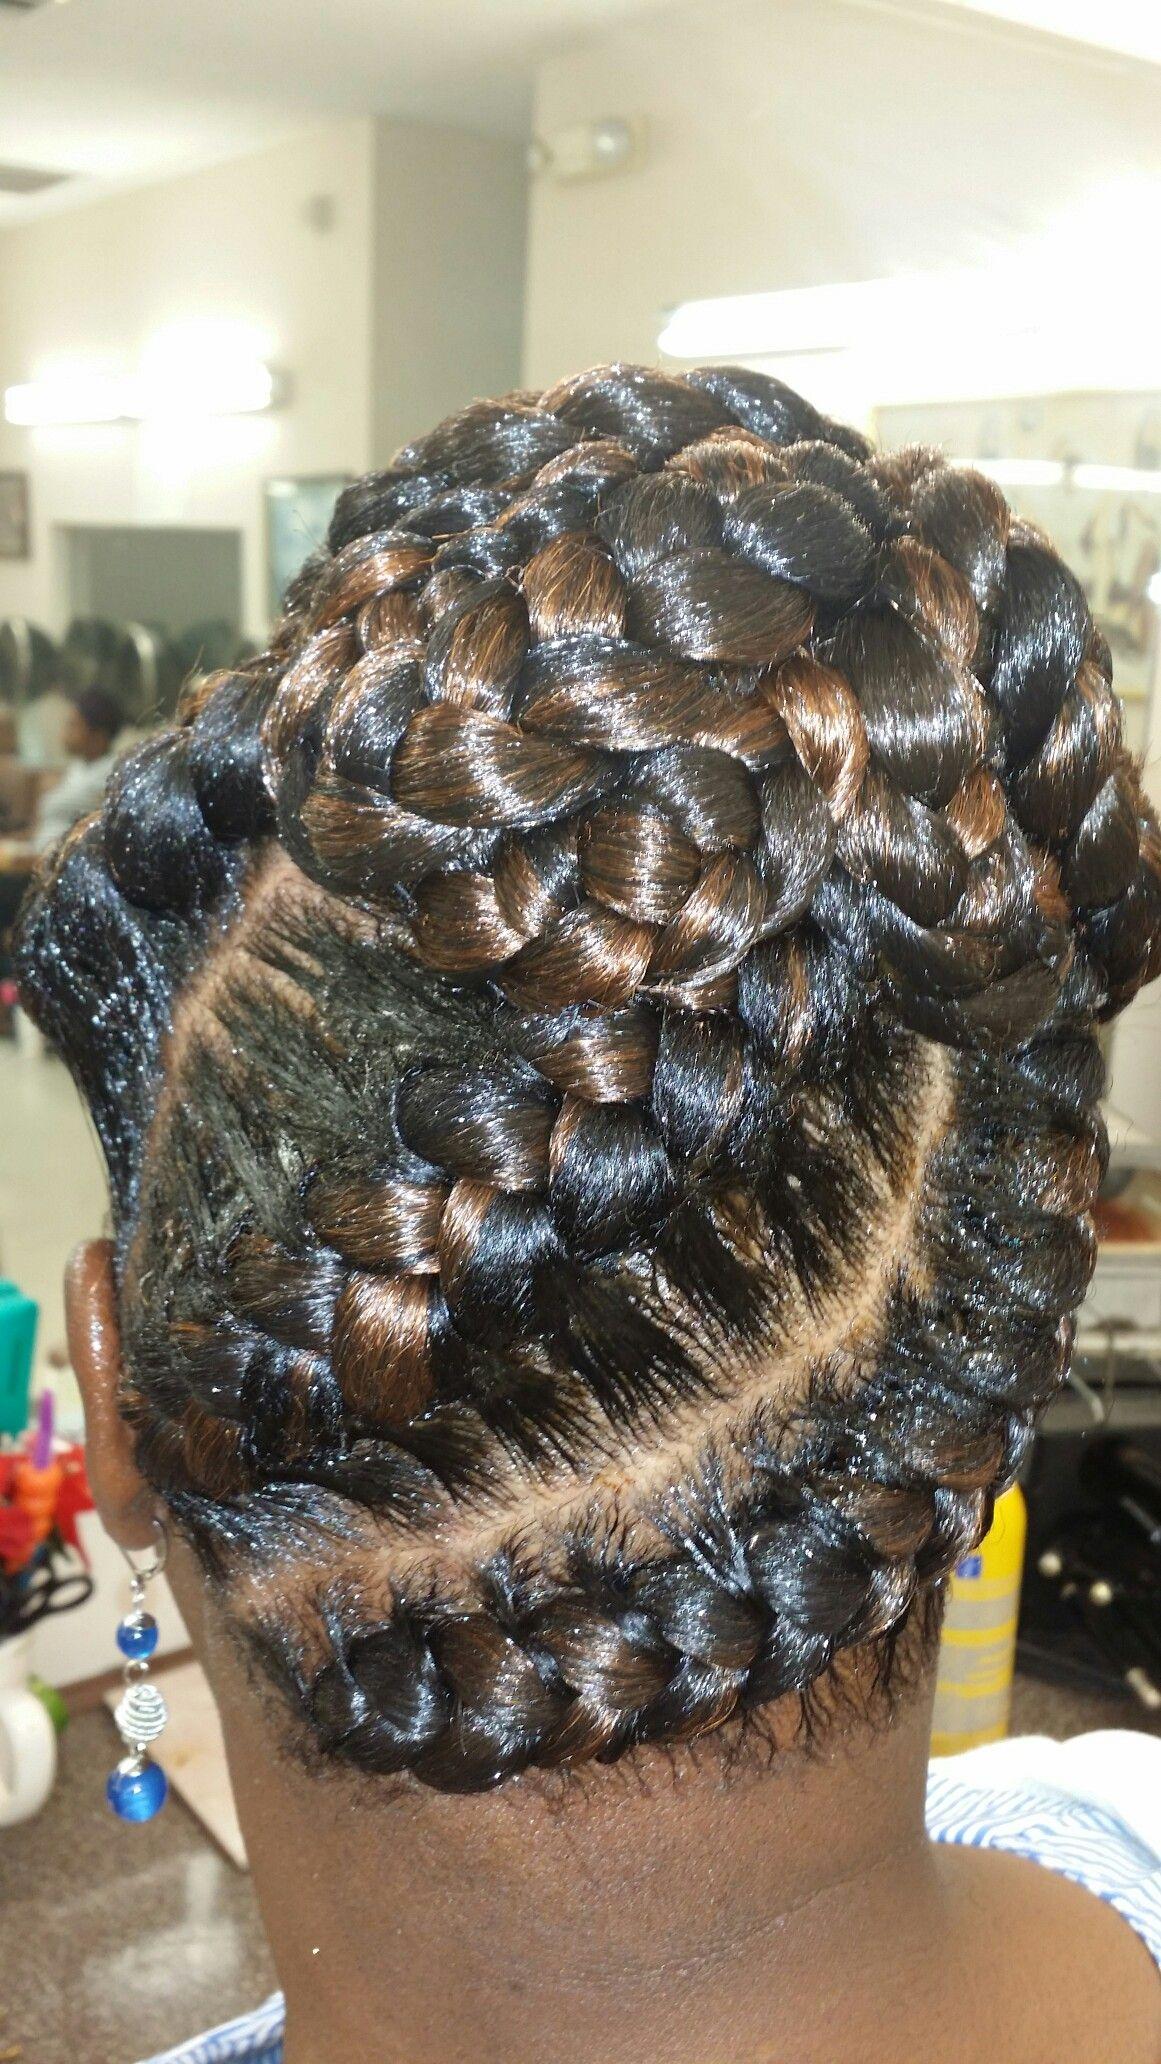 Black hair updo hairstyles image by Jeanne Henderson on ...